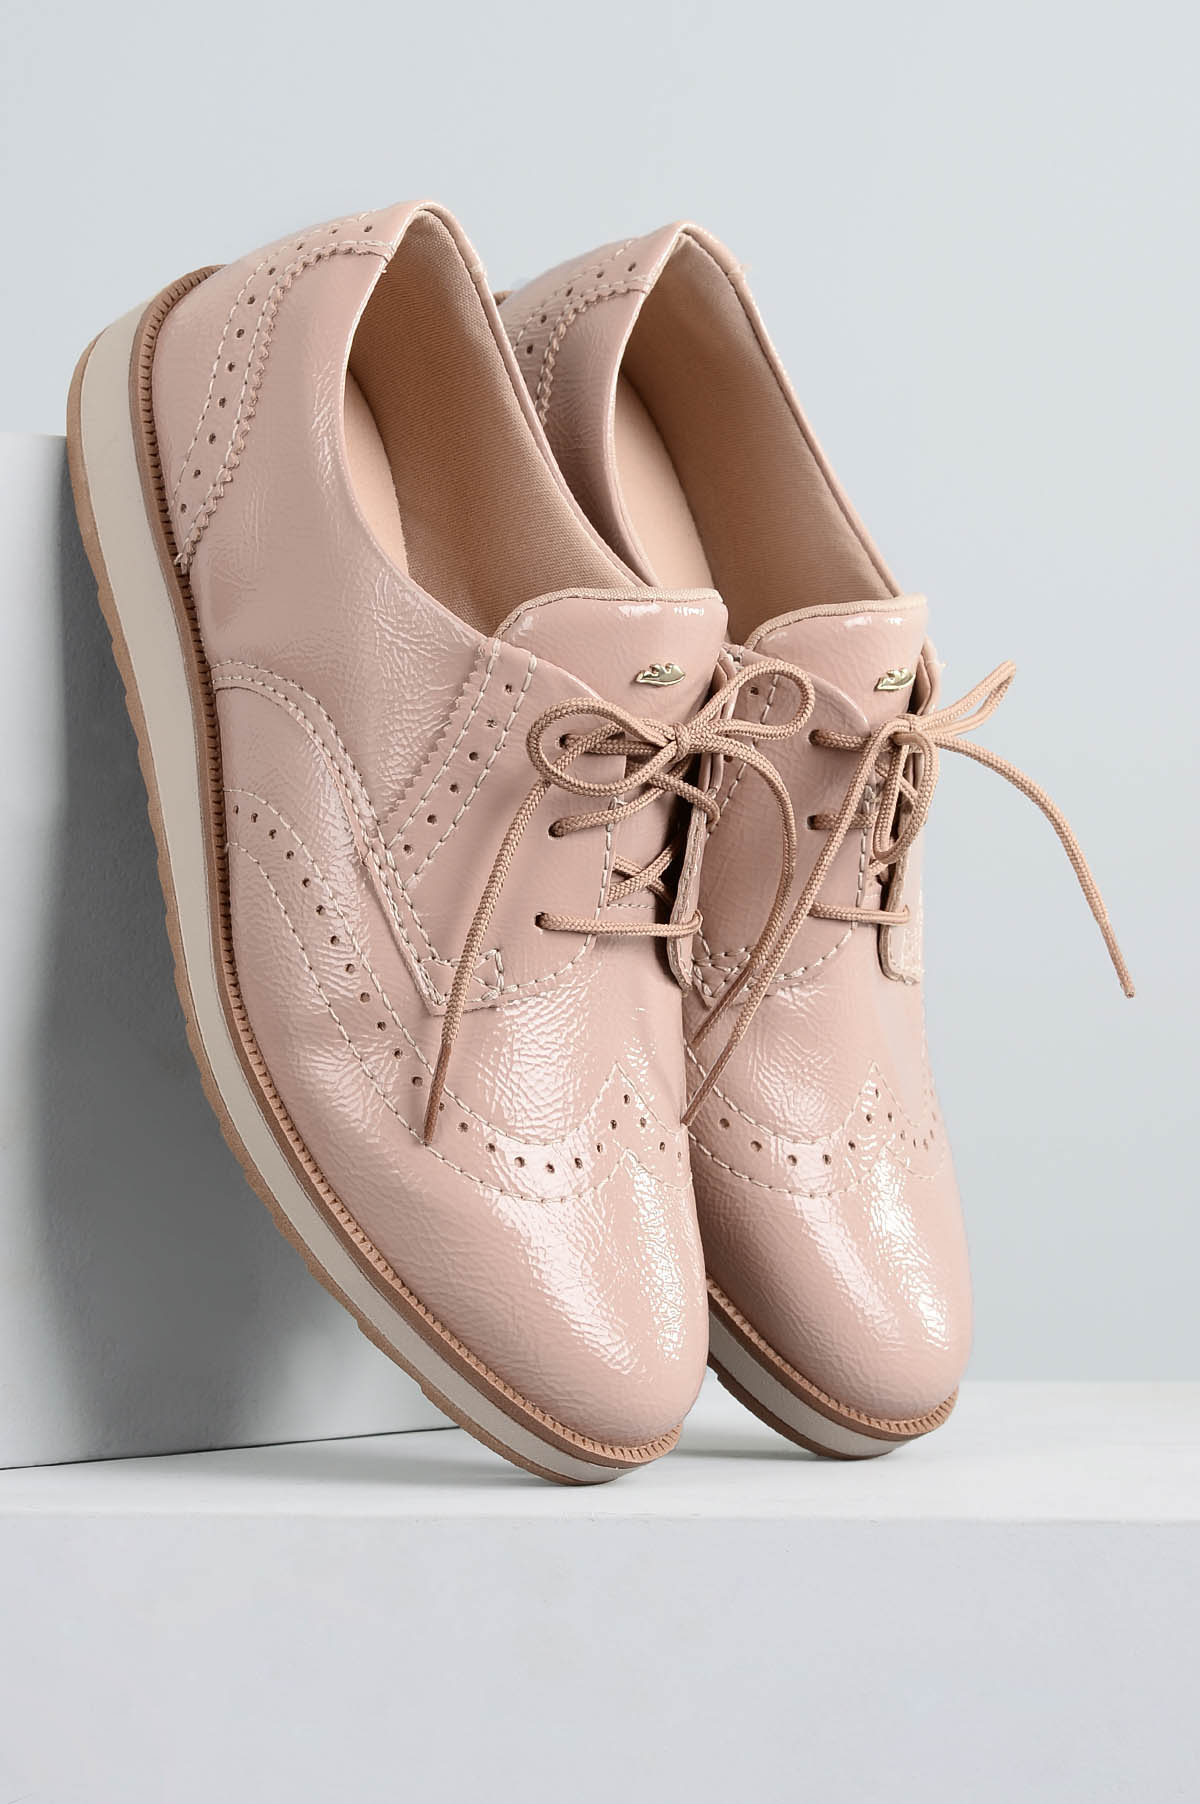 63fb6a6195 Oxford Feminino Dilan Dakota VERNIZ - NUDE - Mundial Calçados